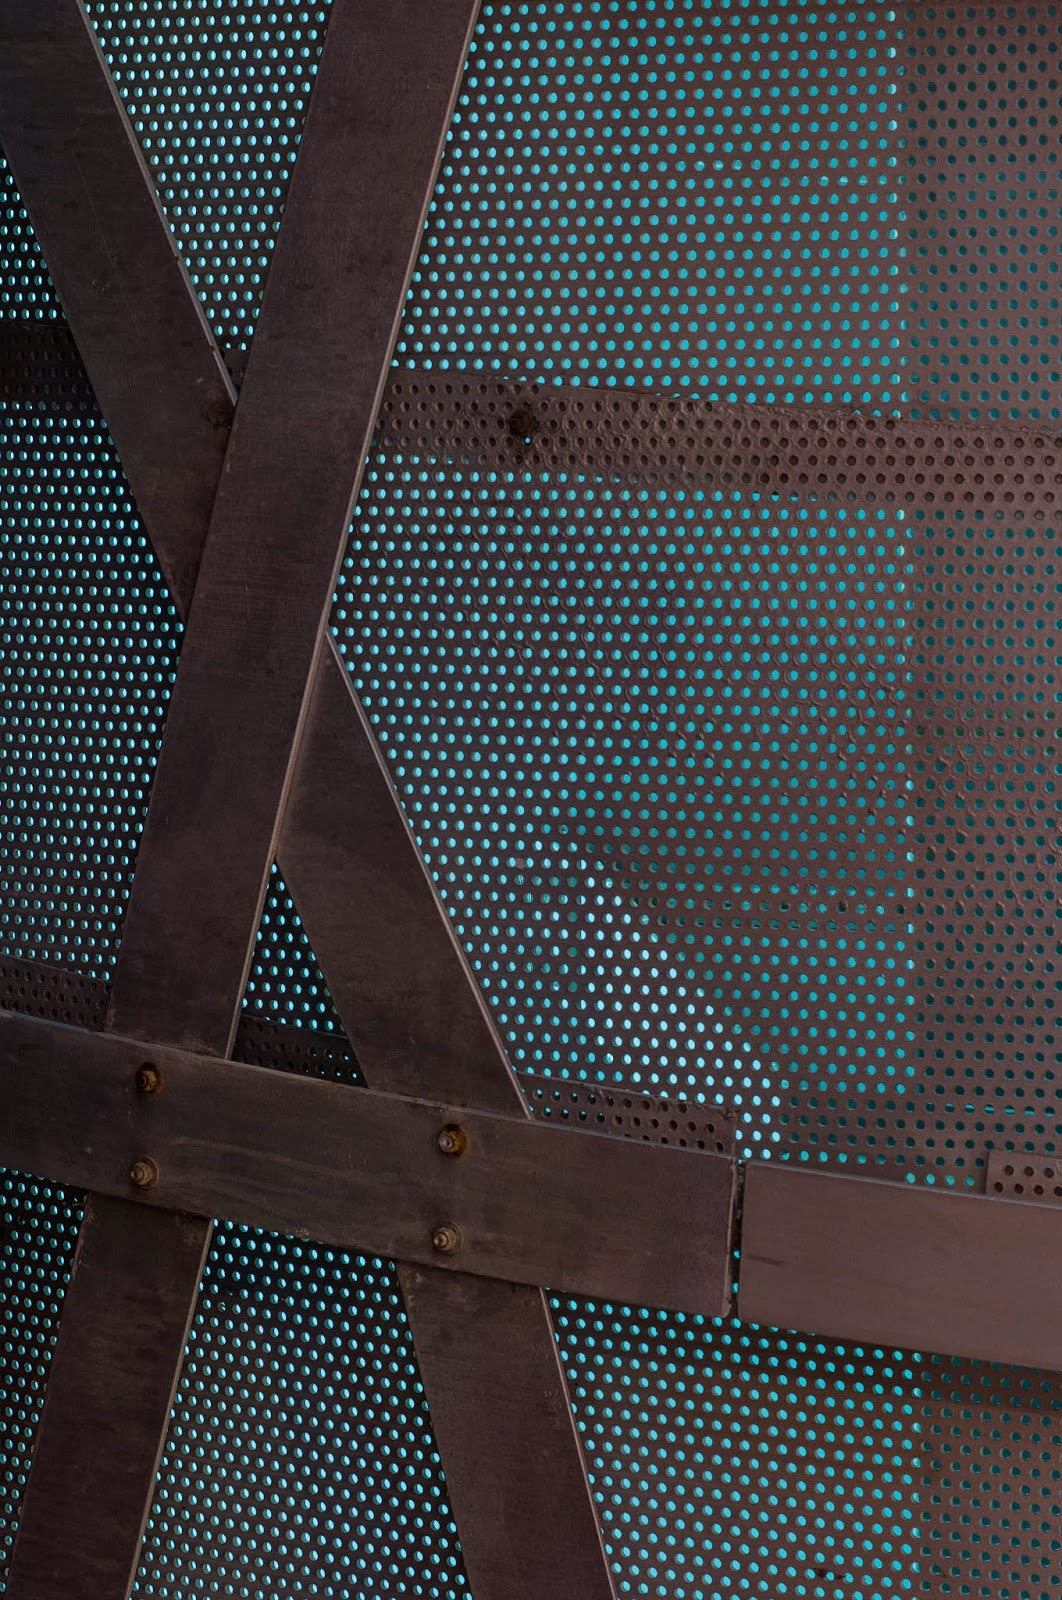 Denton, Corker, Marshall, Robert Owen, architecture, post modern, bridge, webb bridge, melbourne, australia, docklands, tim macauley, abstraction, abstract, detail, architectural, architects, atmospheric, night time, exterior, postmodern, pedestrian,  landmark,